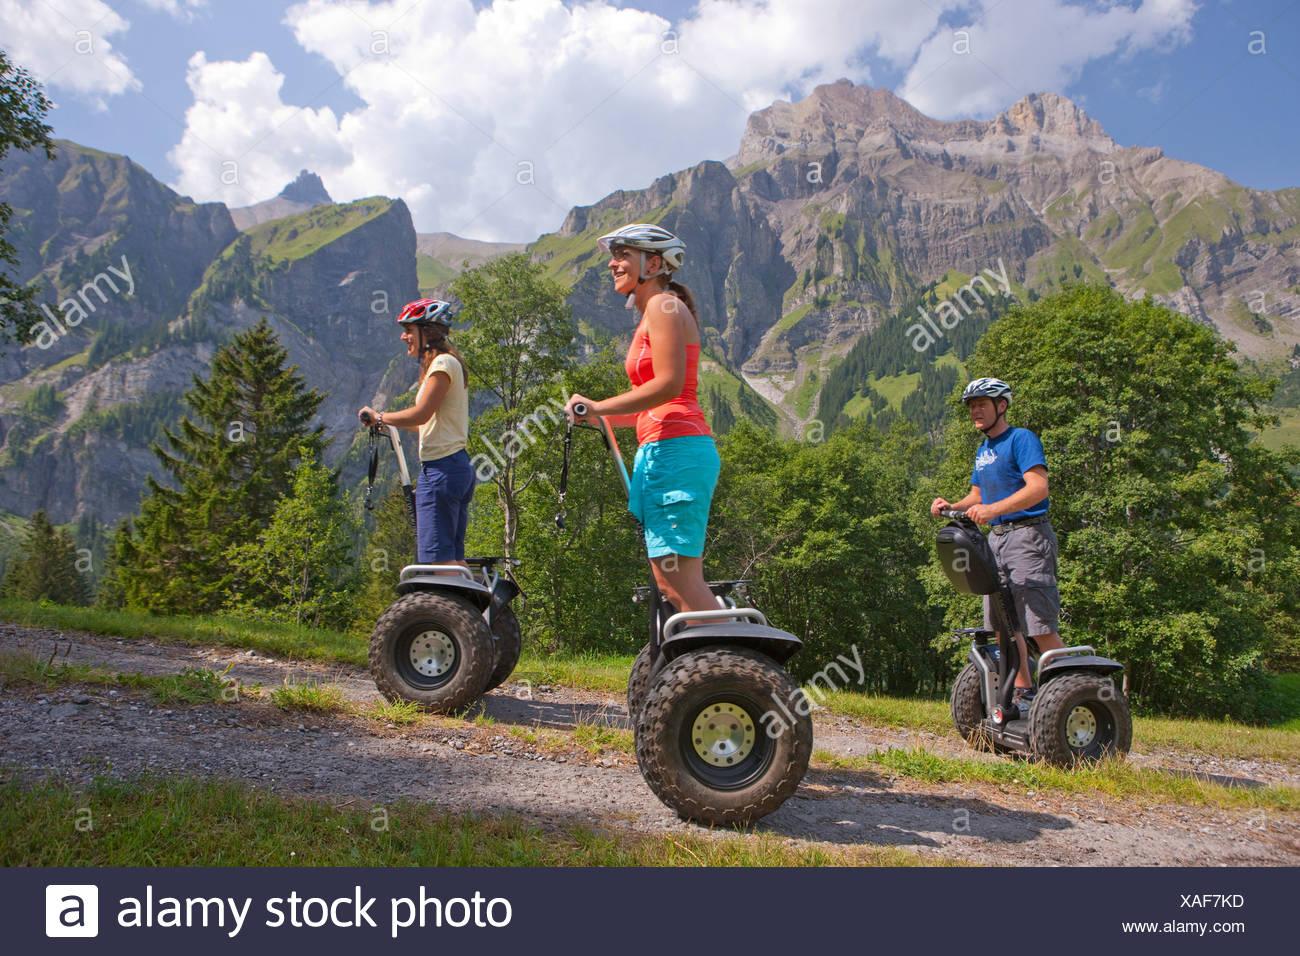 Segway, Zweirad, Fahrzeug, persönliche Transporter fahren, Adelboden, Wanderweg, walking, Wandern, trekking, Kanton Bern, Berner Stockbild